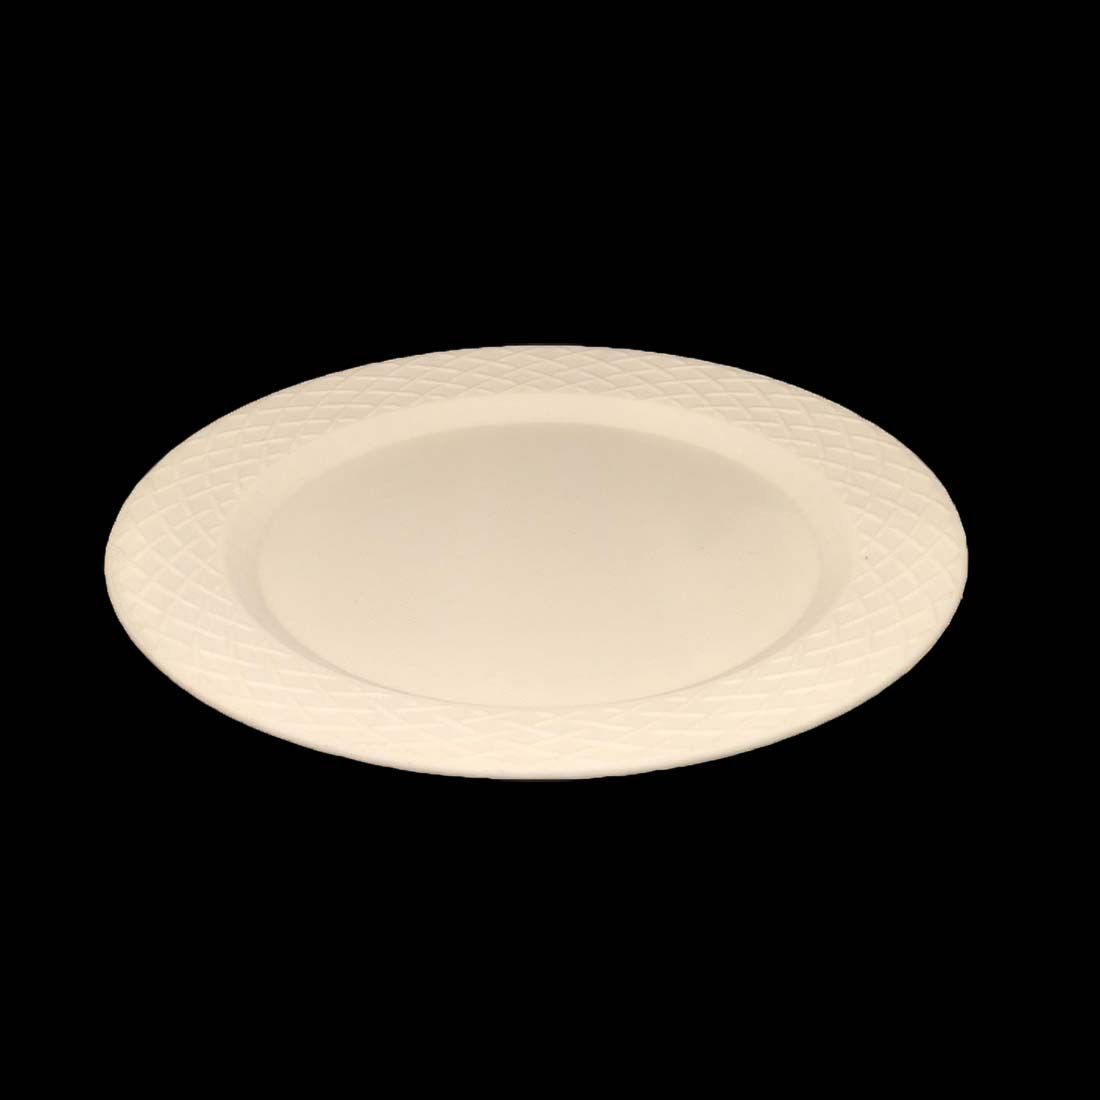 3d Printed Plate Plate Customdinnerplate Dish Householditem Crockery Dinnerware 3d Design Fdm Technology Abs Filame Plates Dinner Plates Crockery